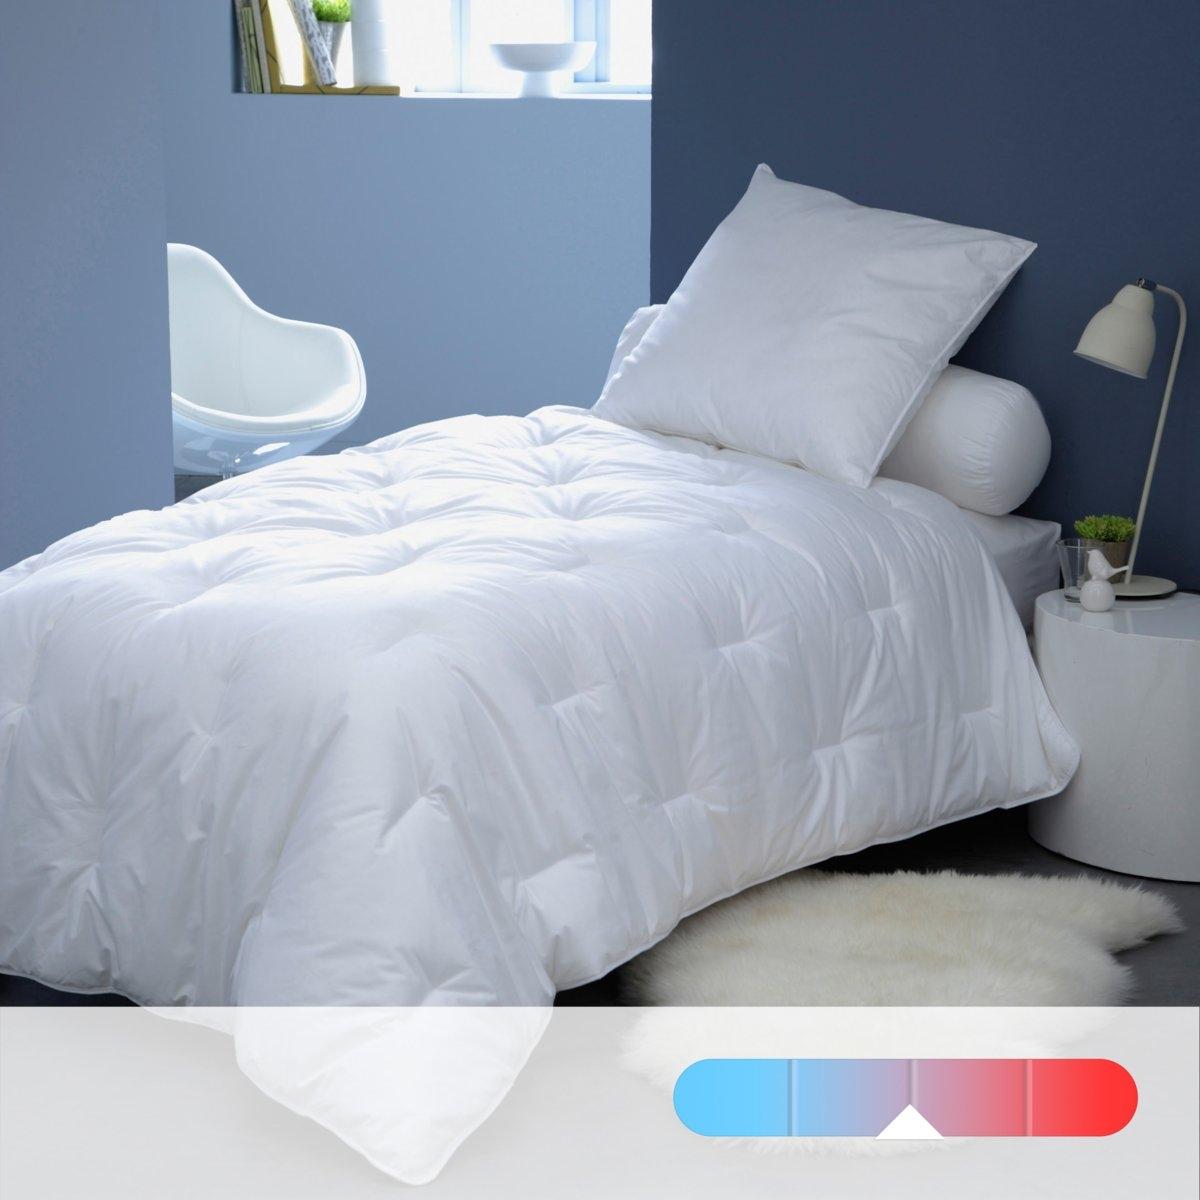 Синтетическое одеяло LESTRA, 350 г/м²